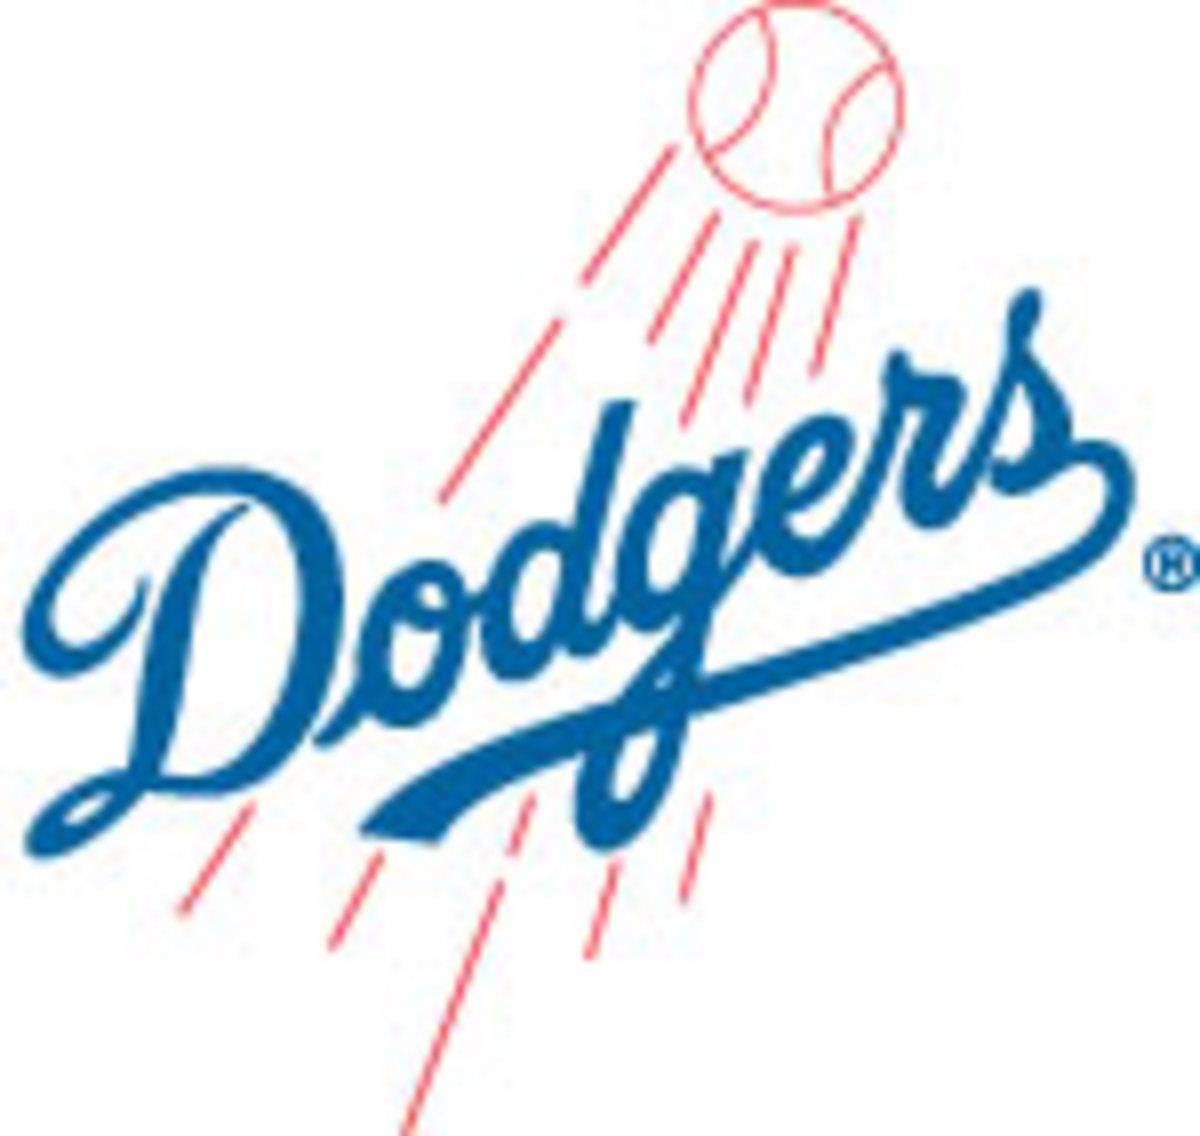 Los Angeles Dodgers logo